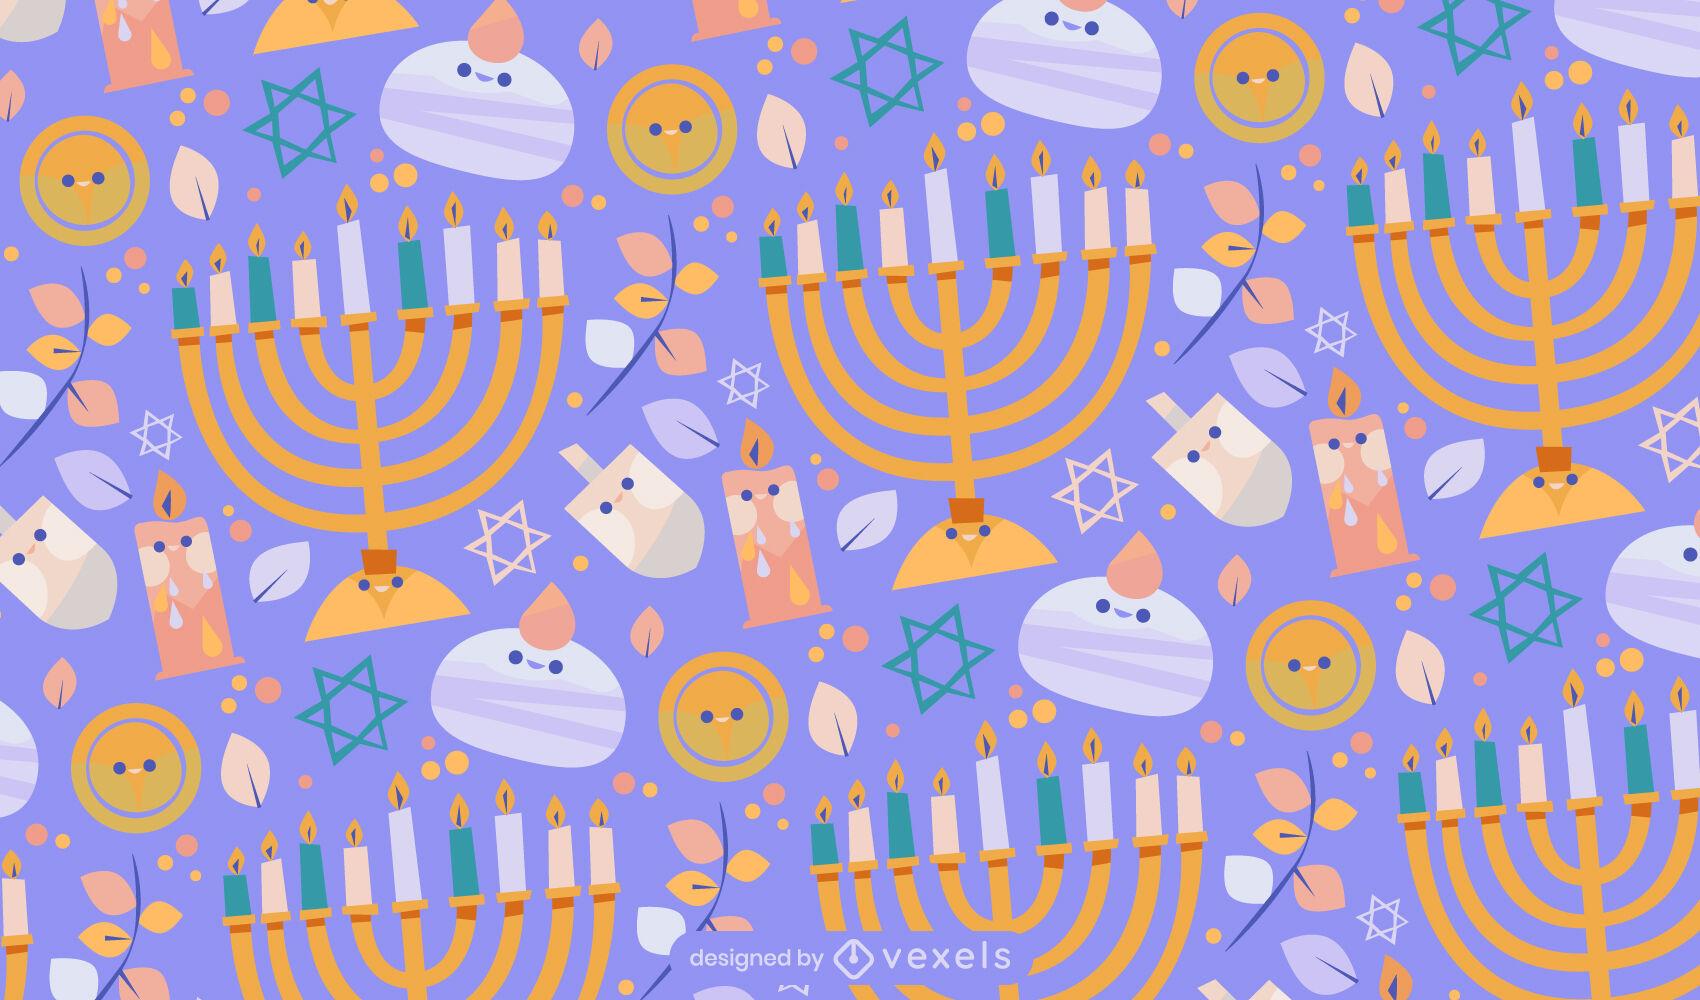 Dise?o de patr?n kawaii de festividad de Hanukkah